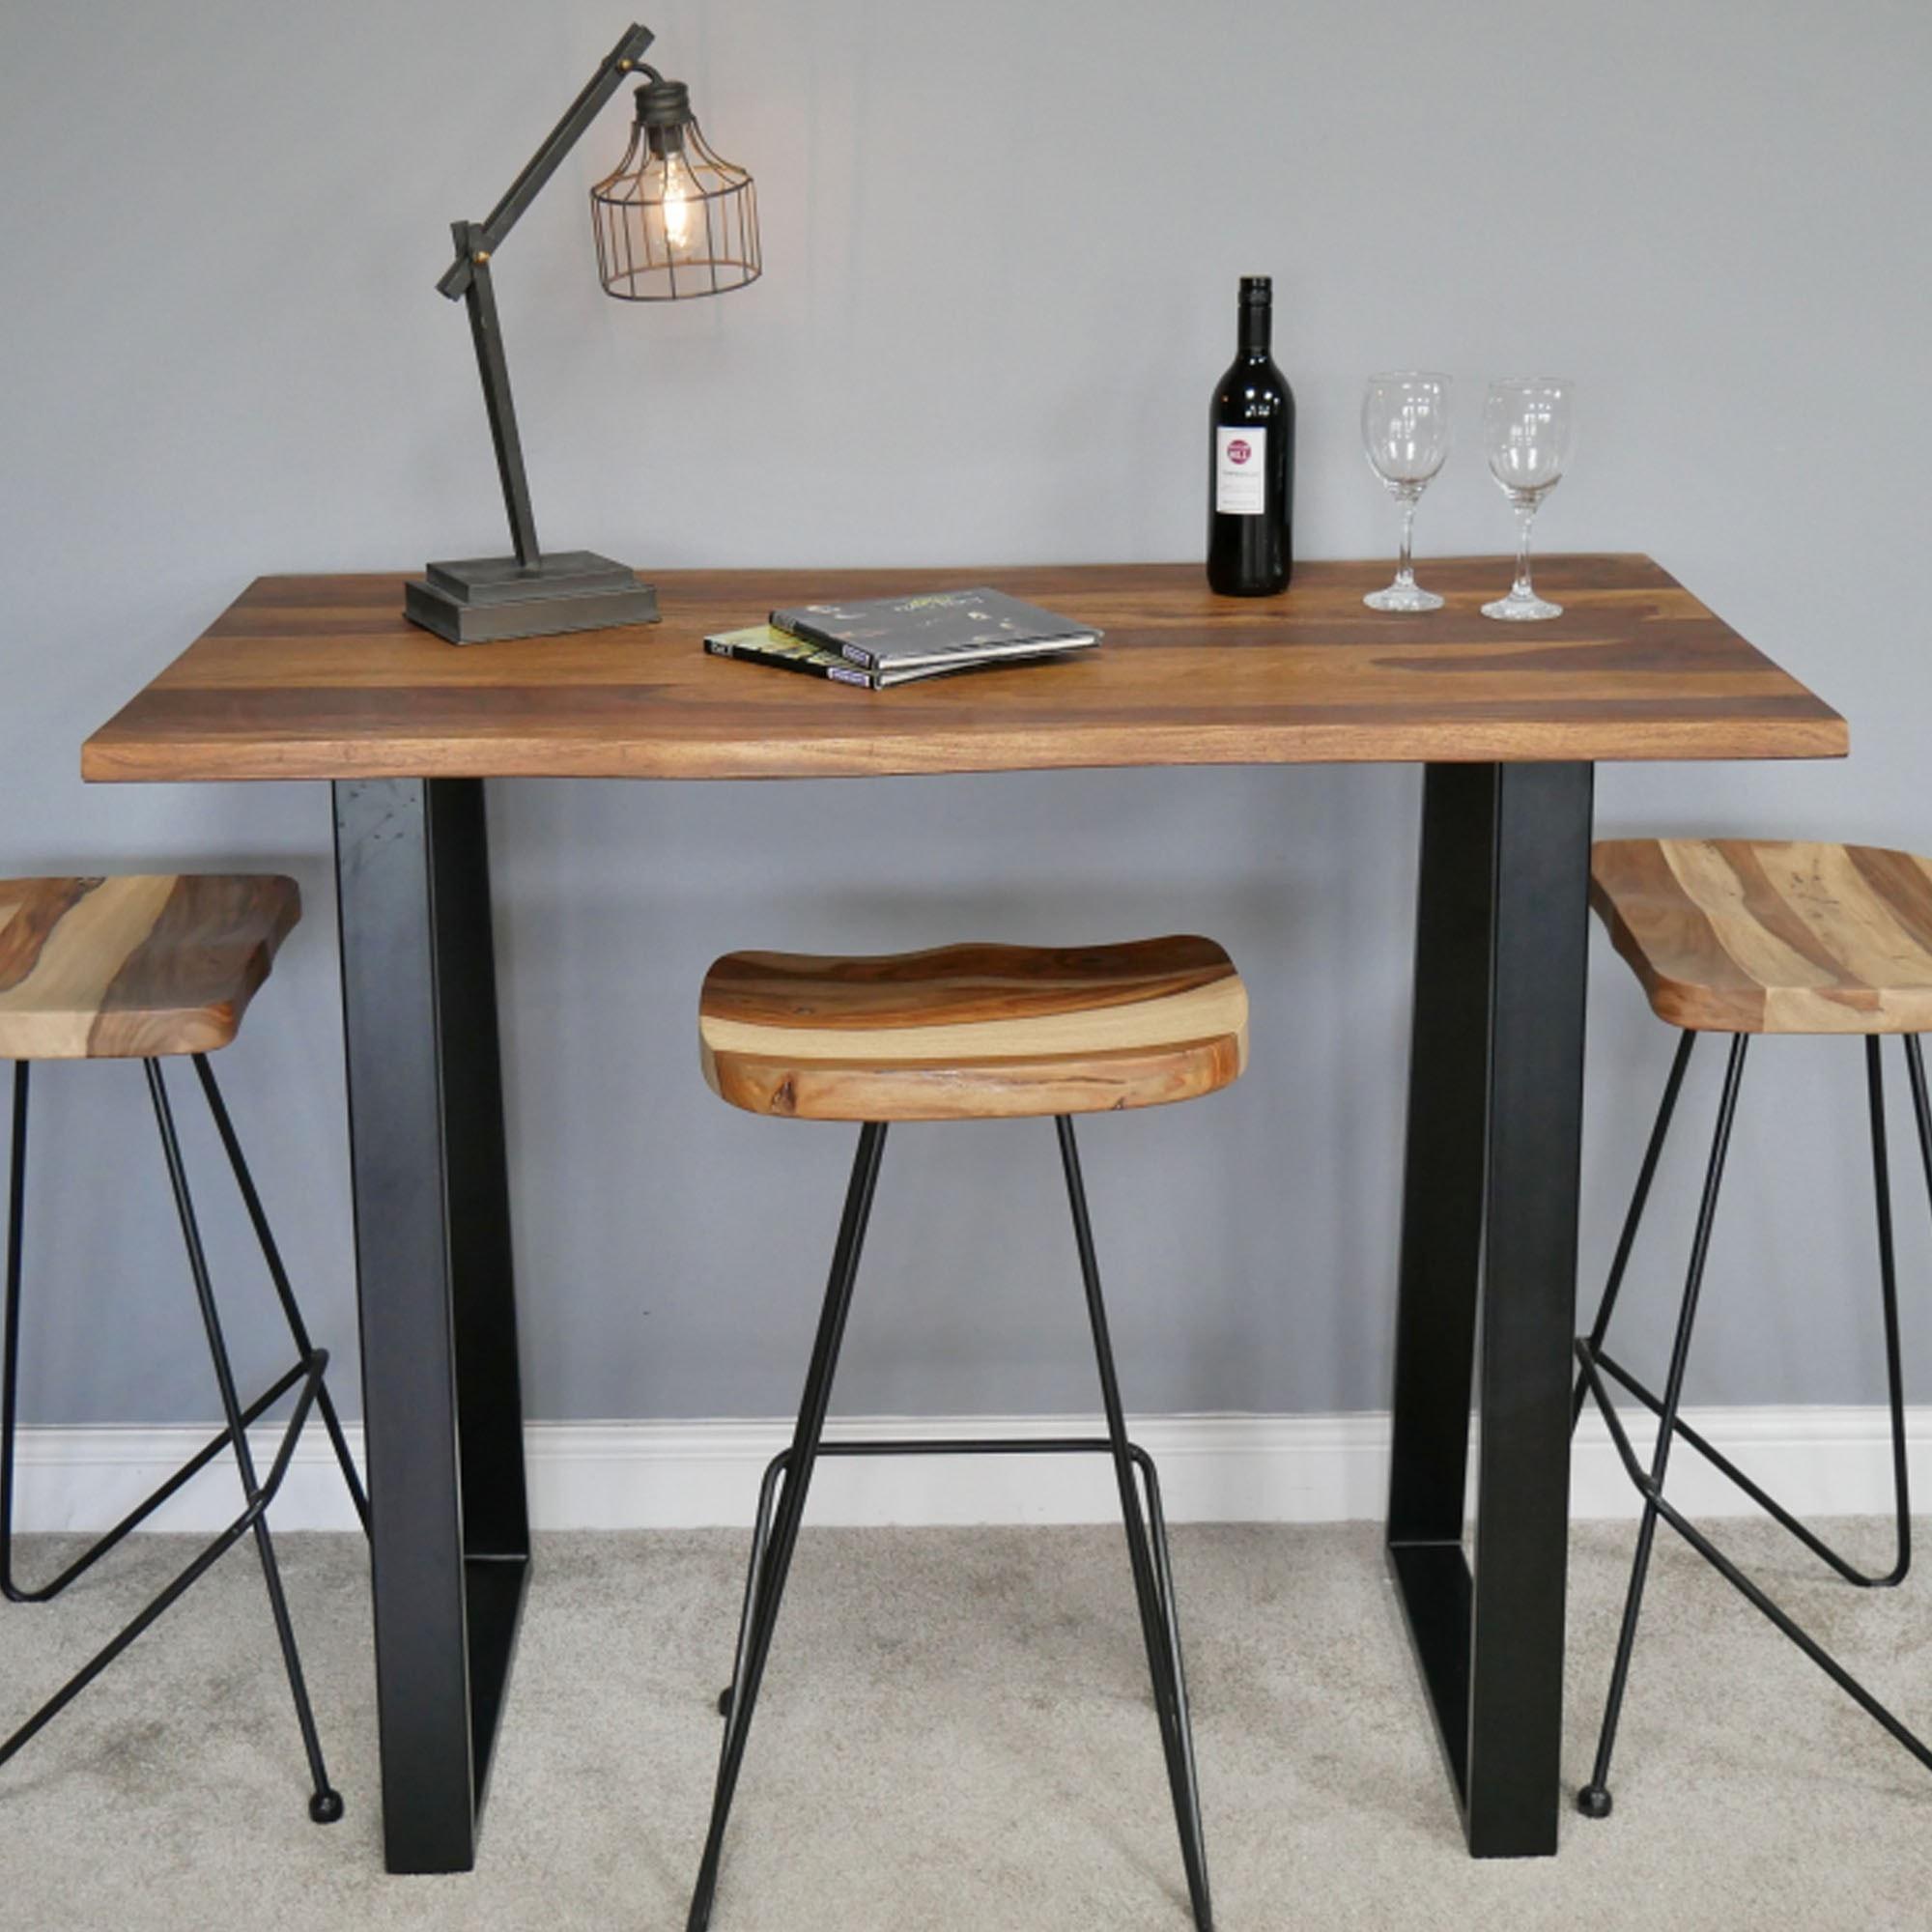 Sheesham Wooden Top Living Edge Breakfast Bar Table